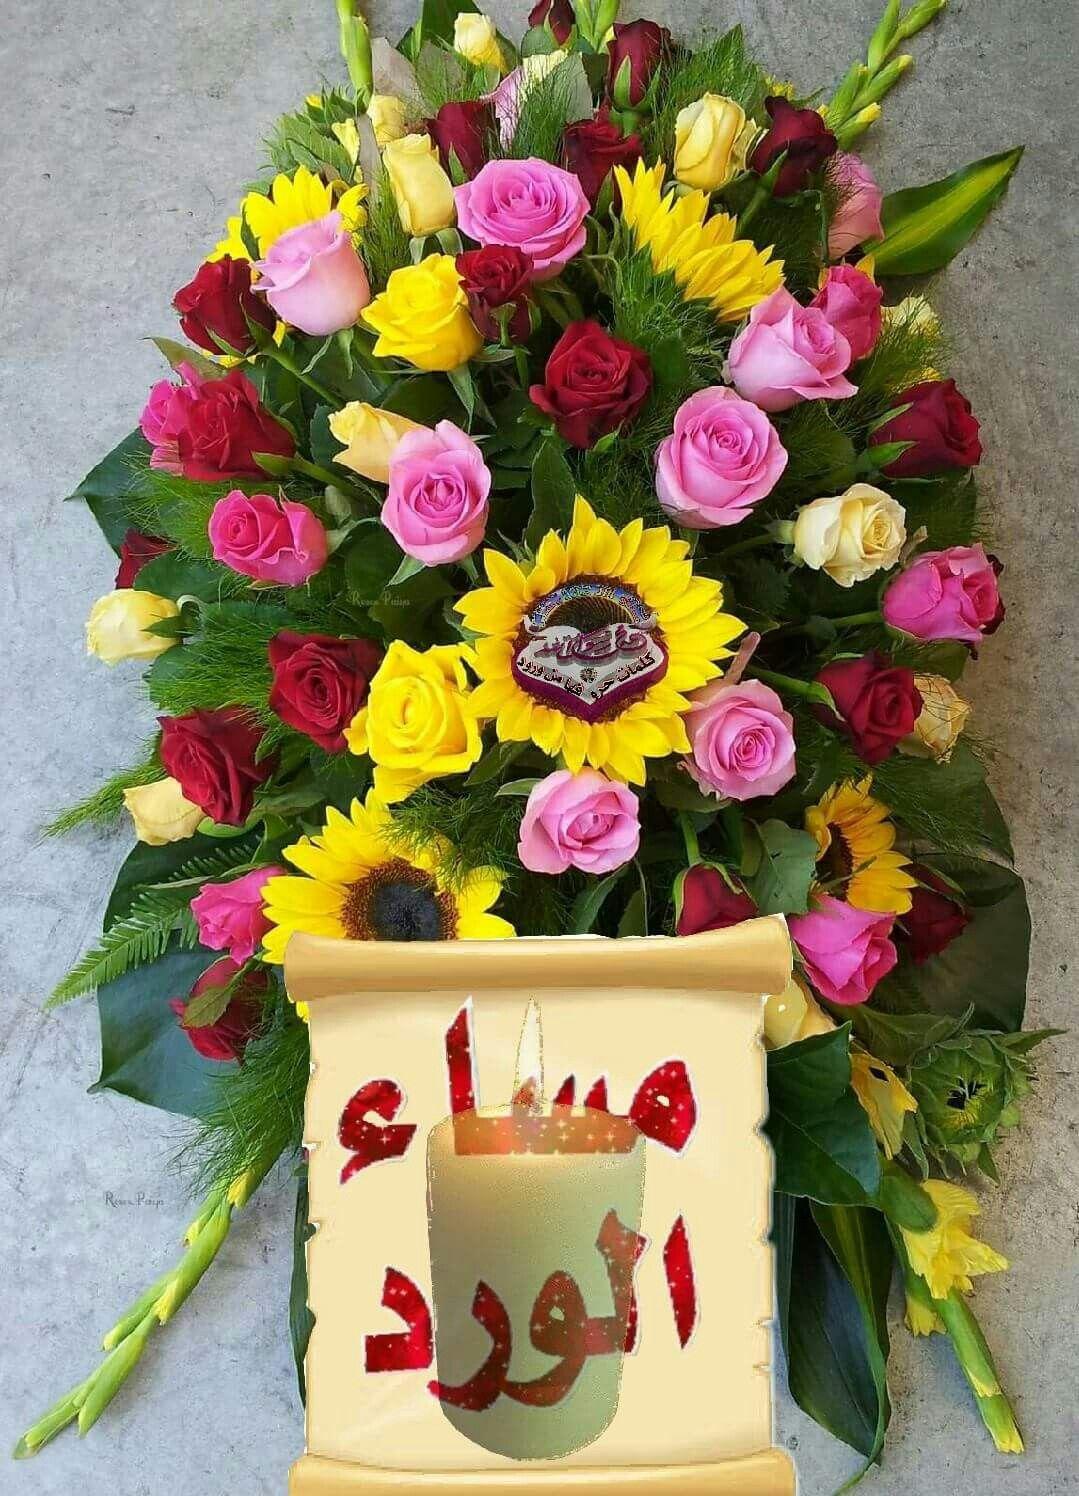 good evening pinterest flowers and rose beautiful flowers roses islam sweetie belle pretty flowers rose izmirmasajfo